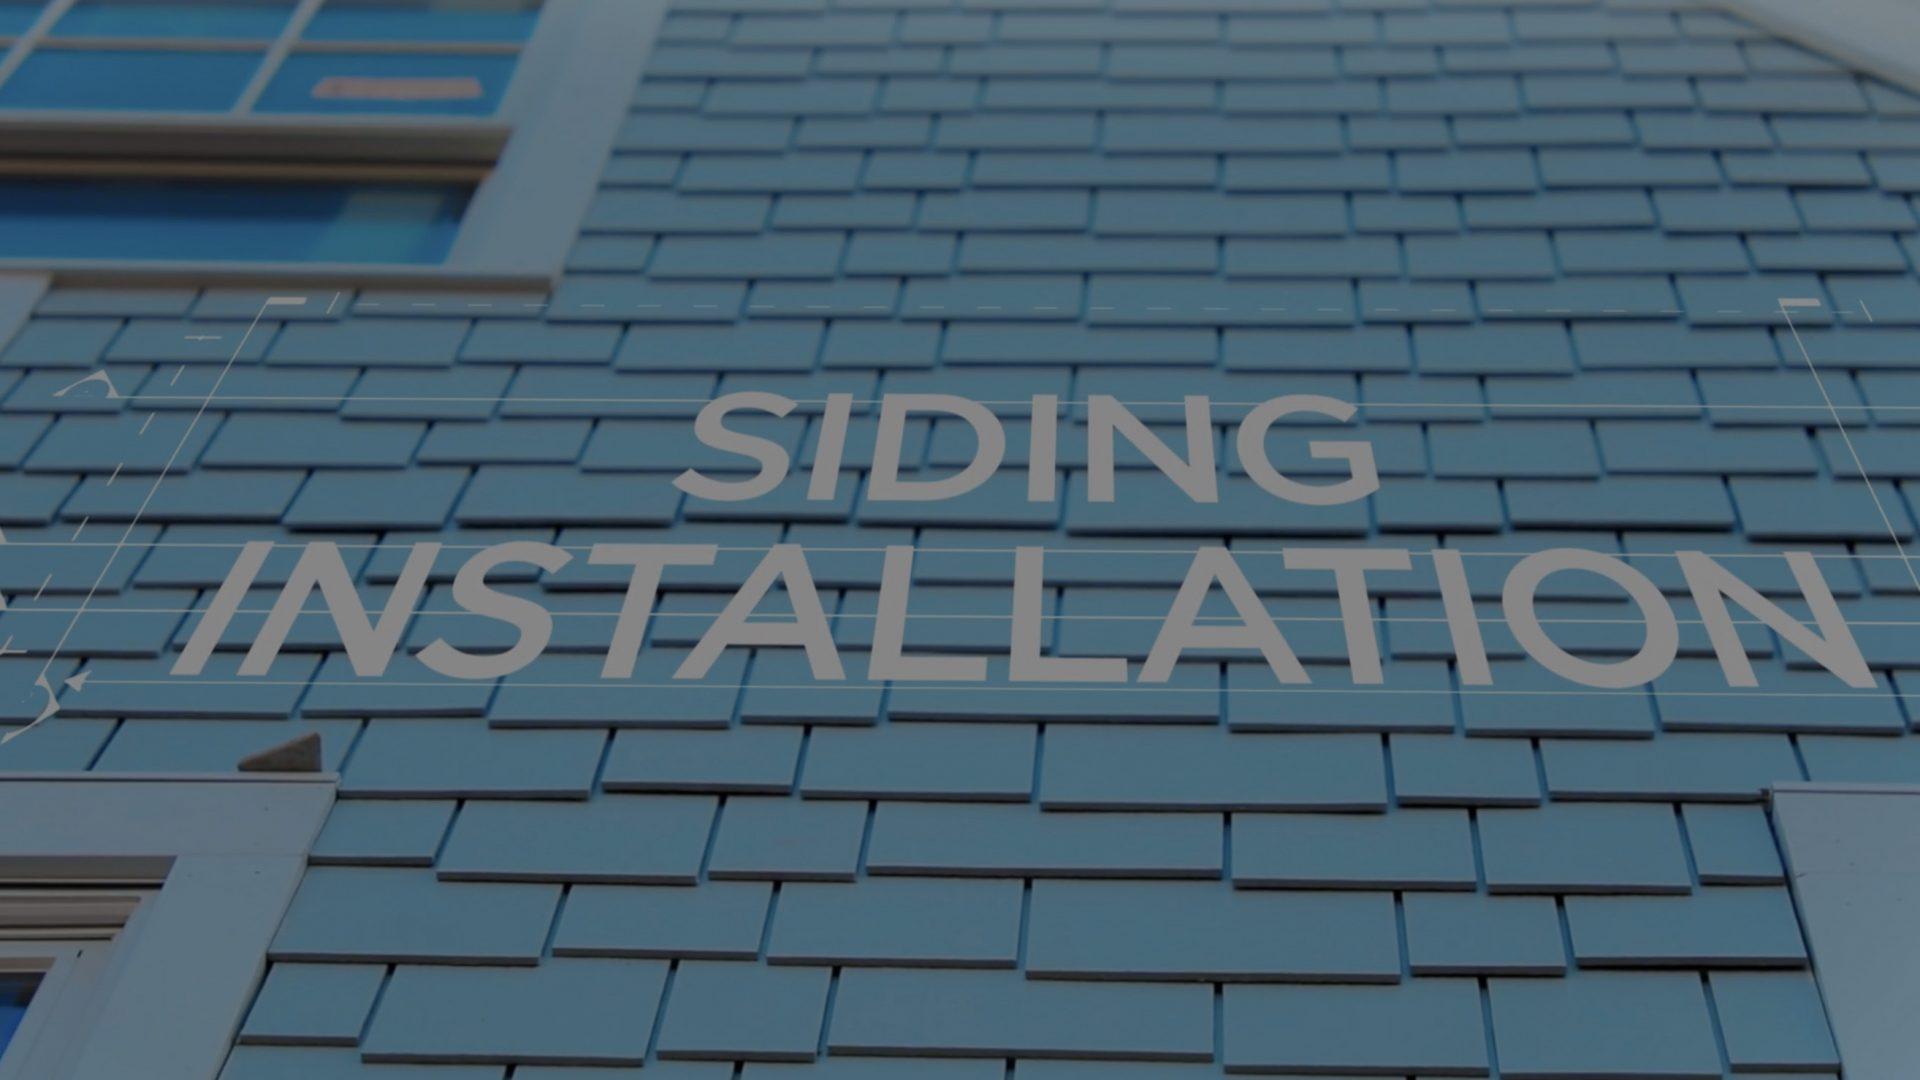 promo video for siding services portfolio